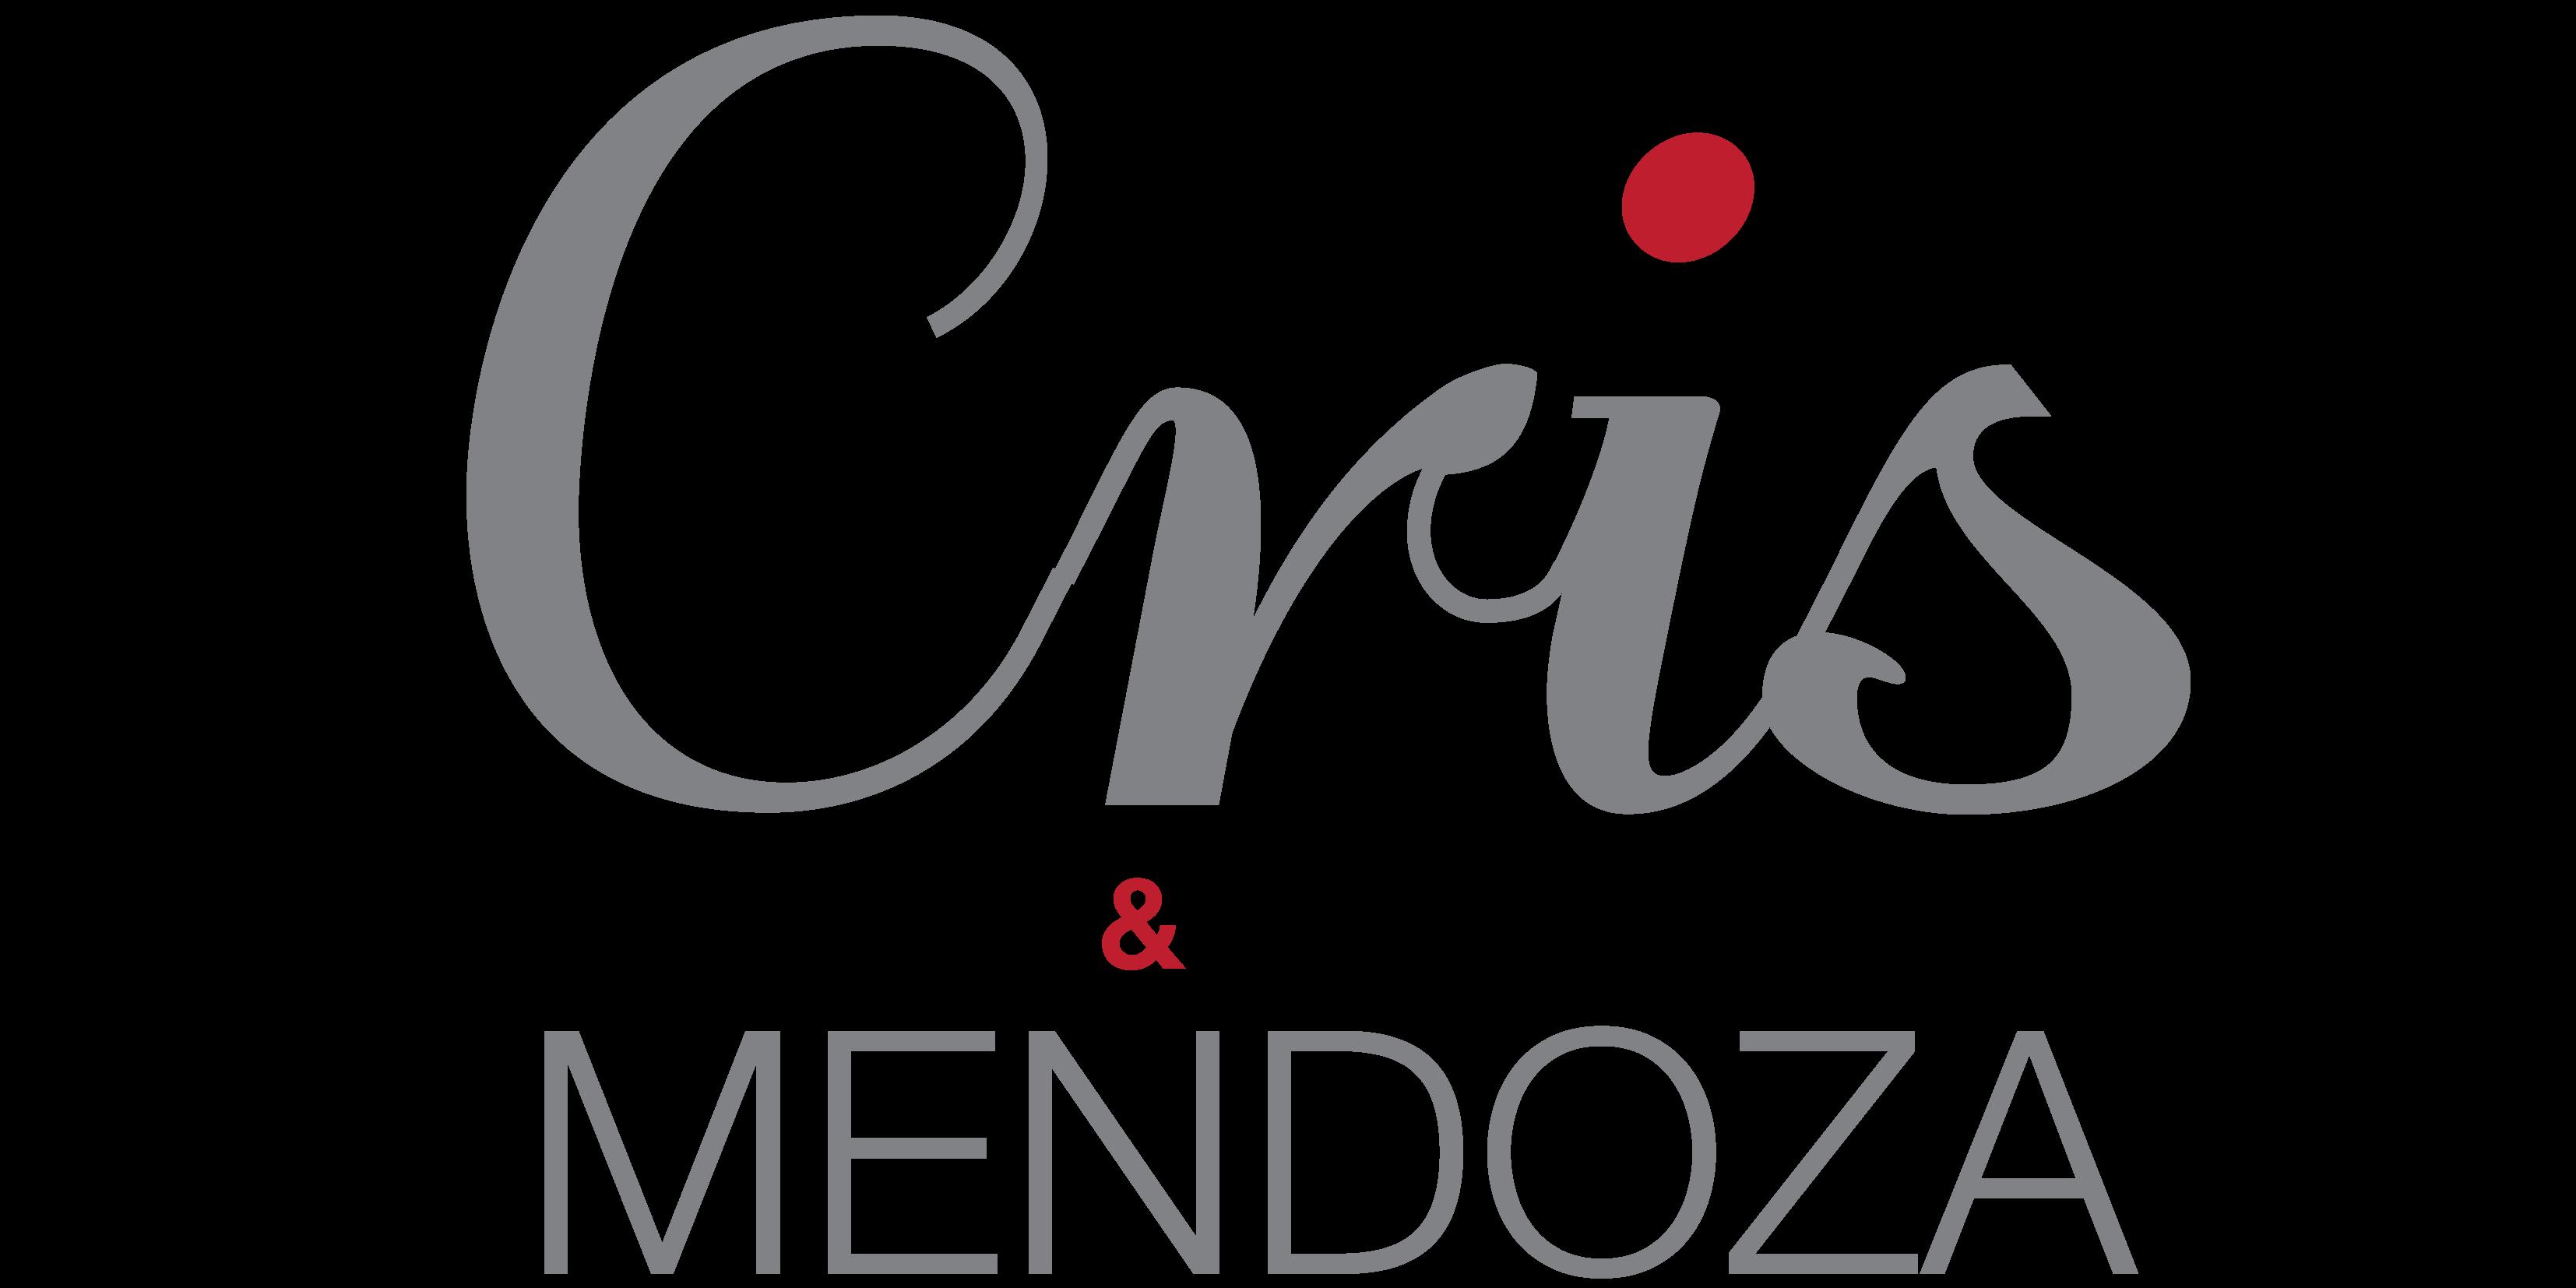 Cris Mendoza: estilo de vida